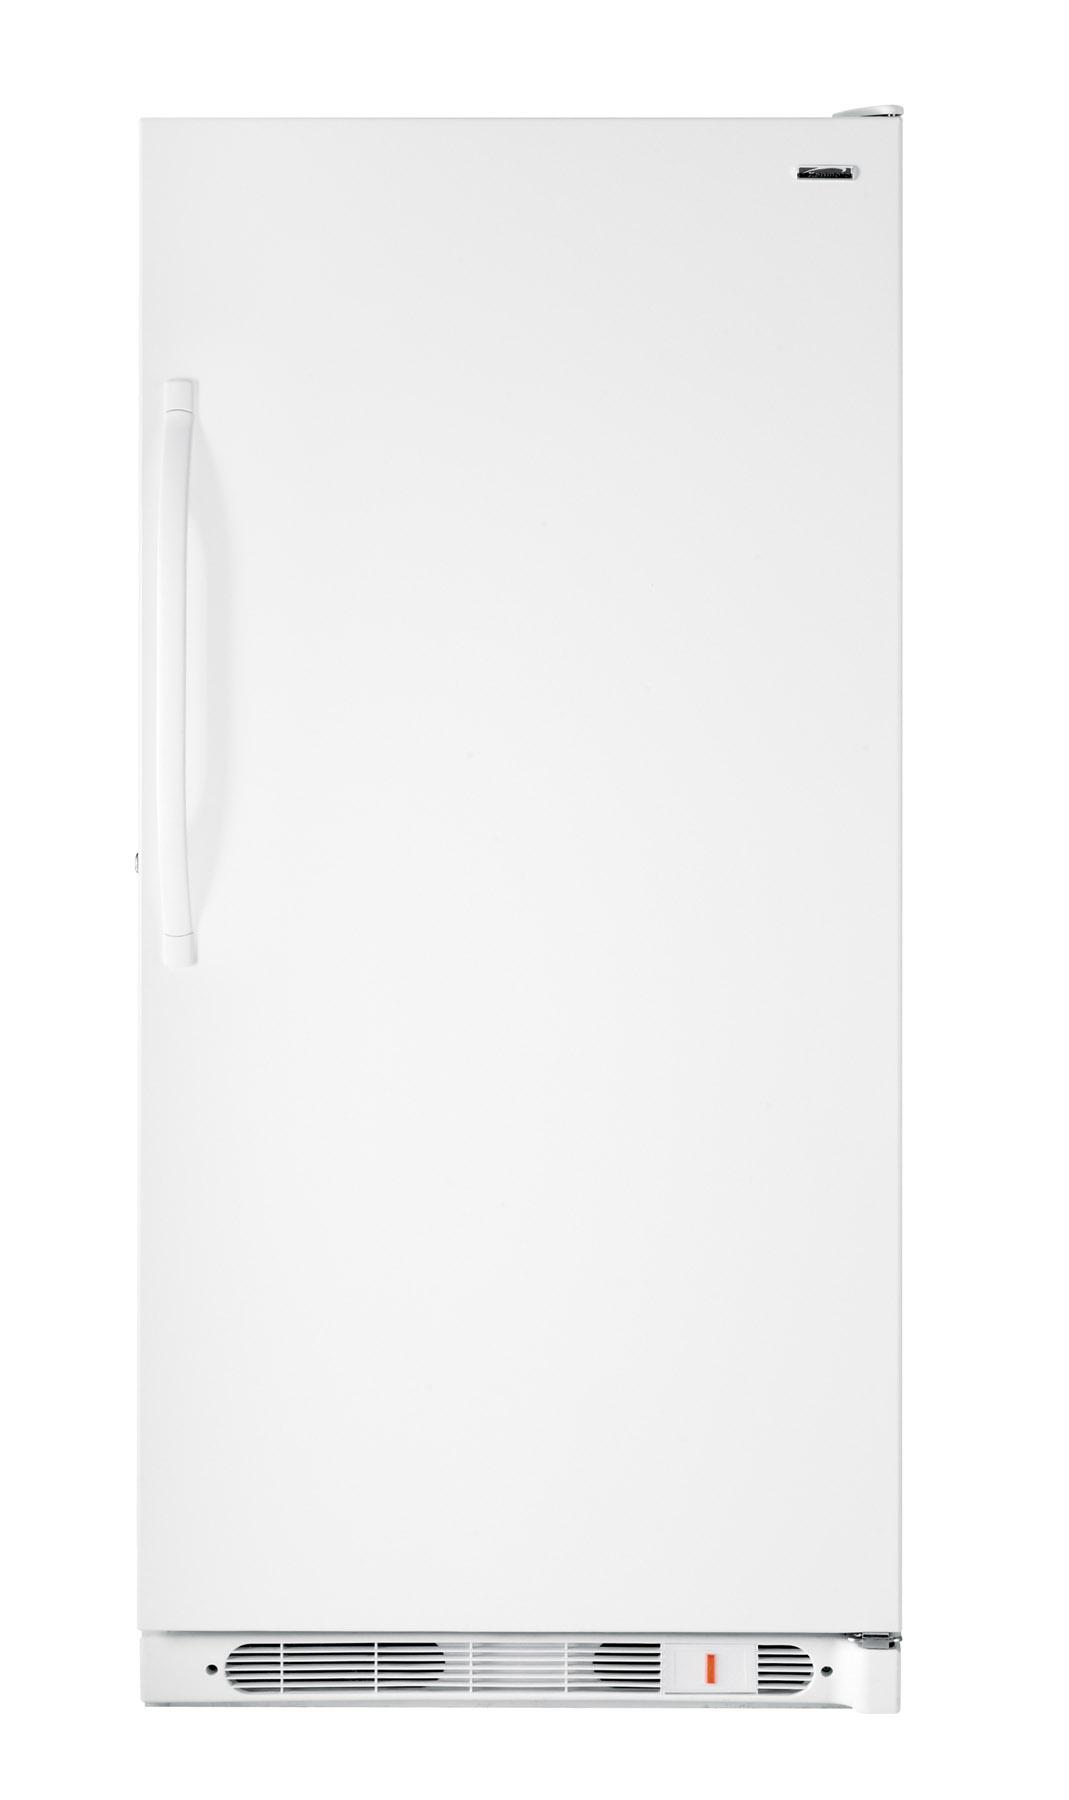 Kenmore Freezer Model 253.28722800 Parts